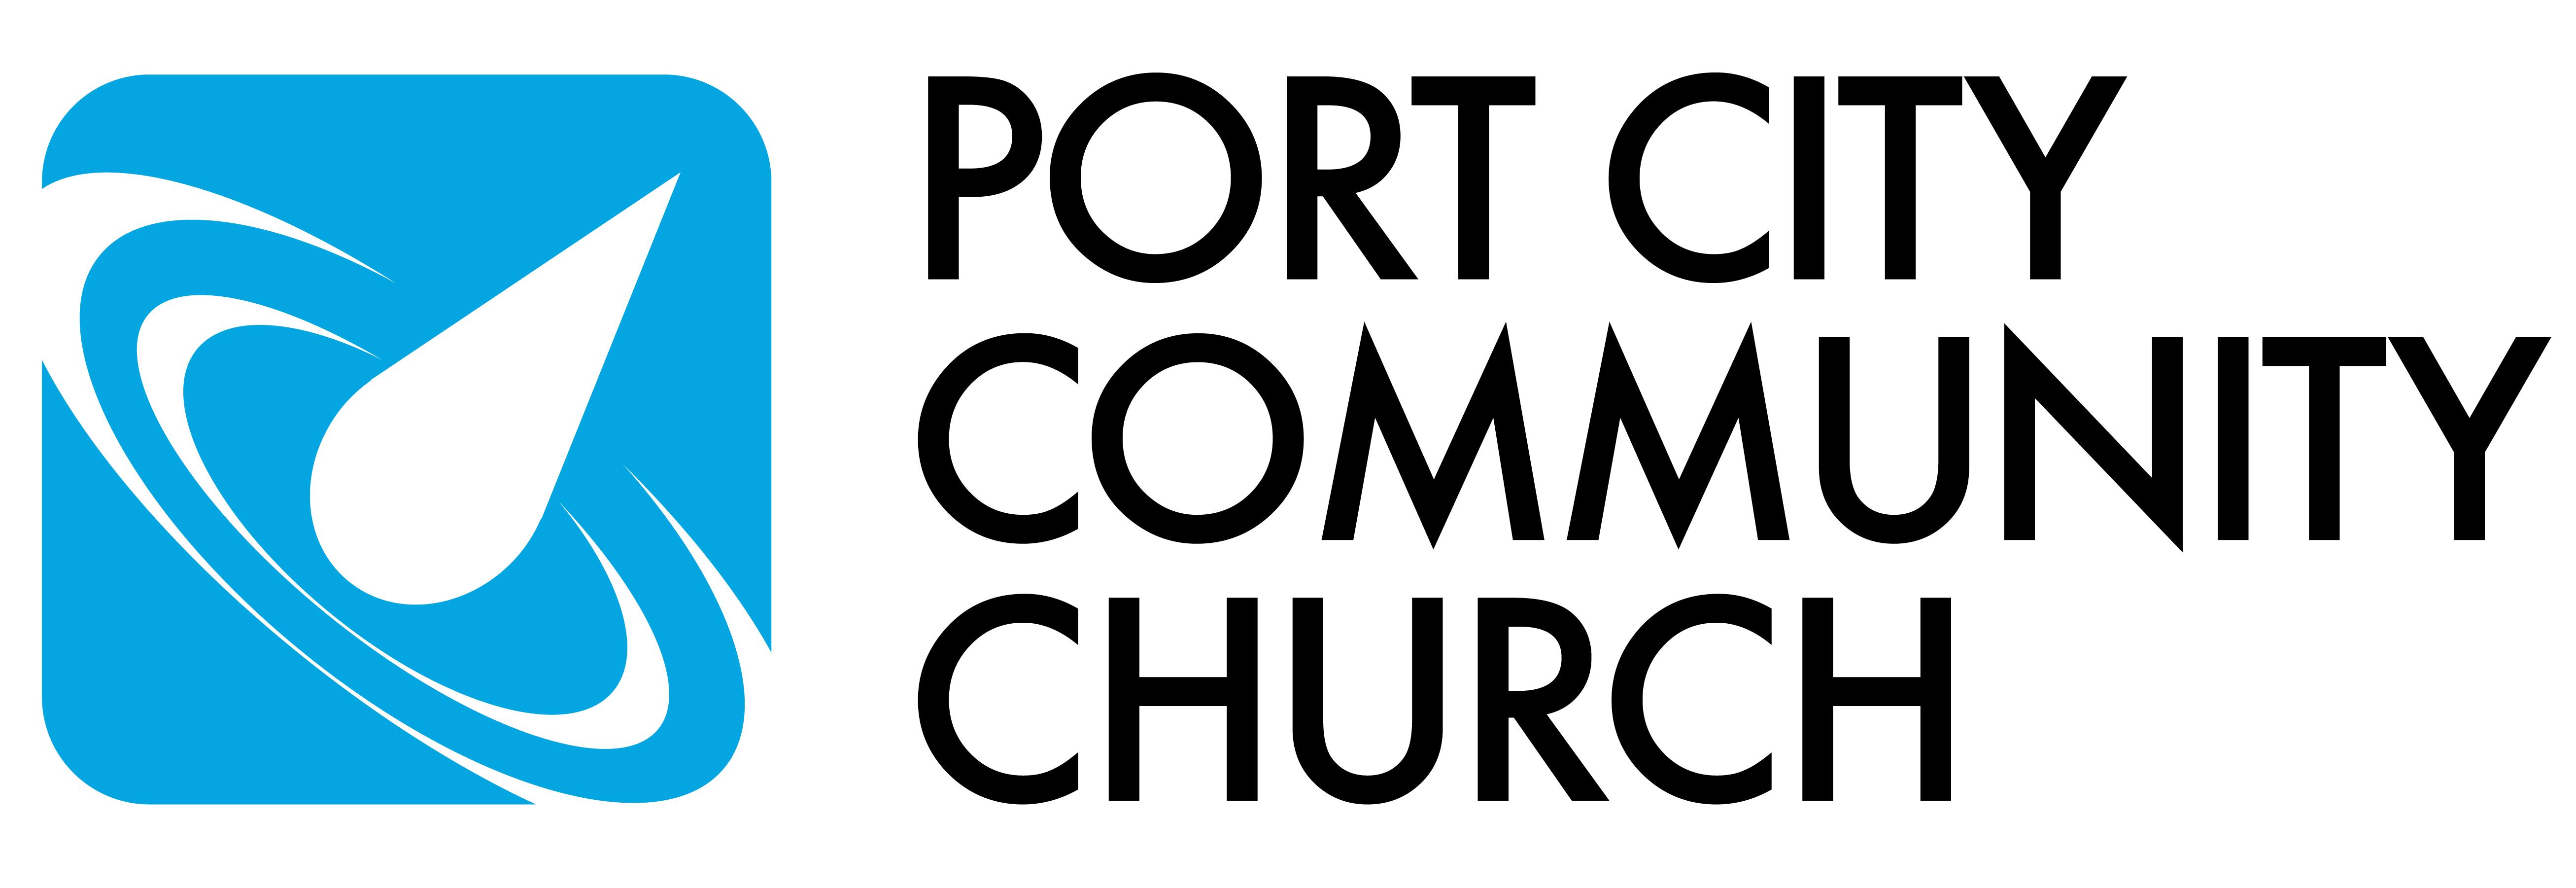 Port city community it. Mission clipart church attendance